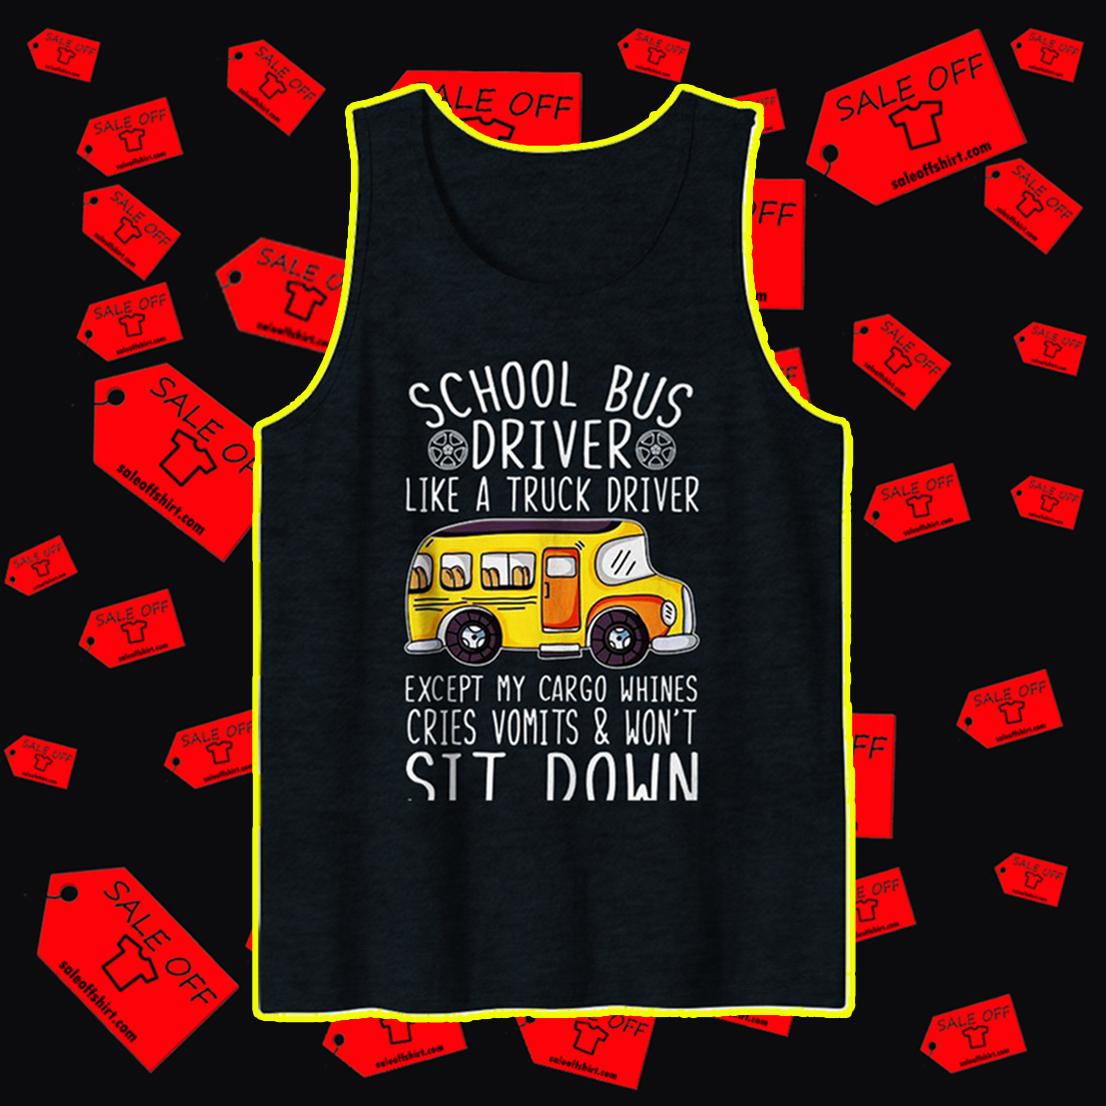 School bus driver like a truck driver tank top